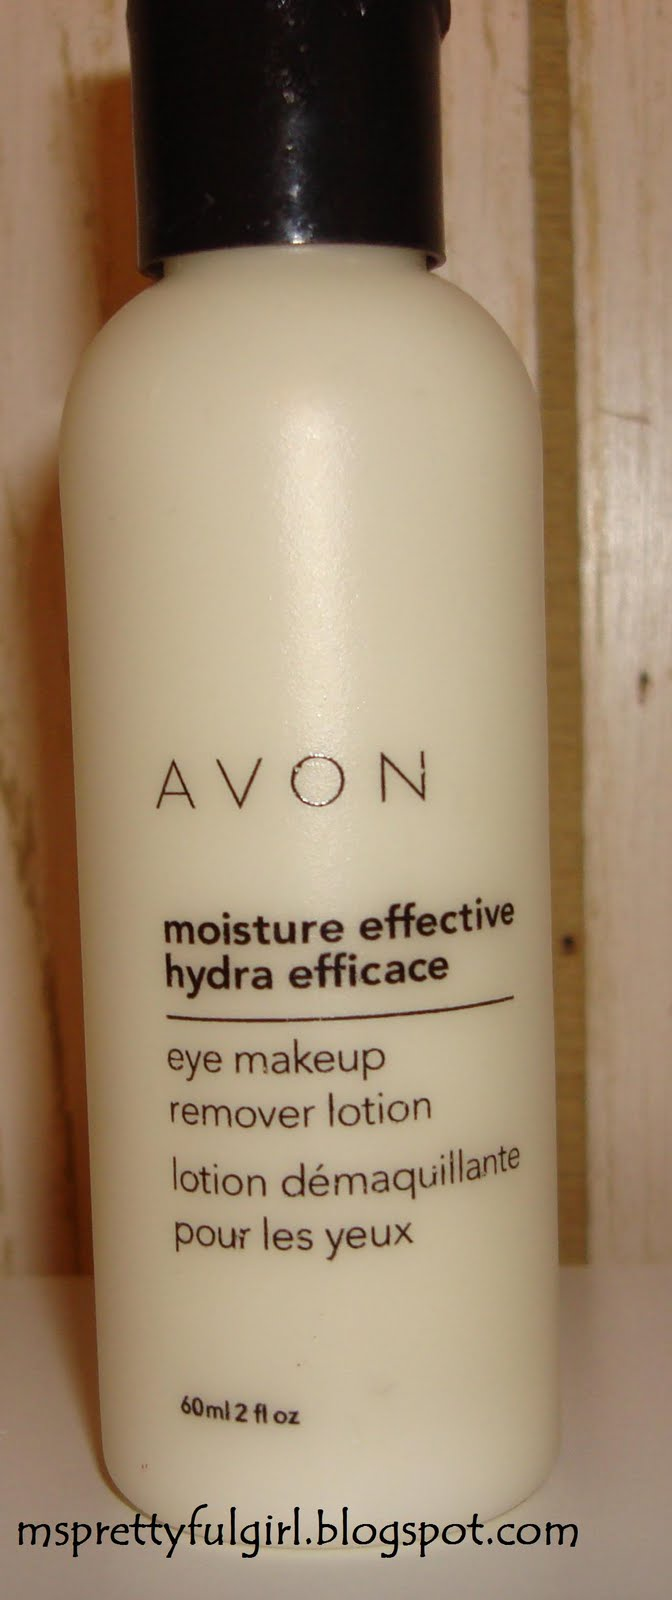 Avon eye makeup remover lotion